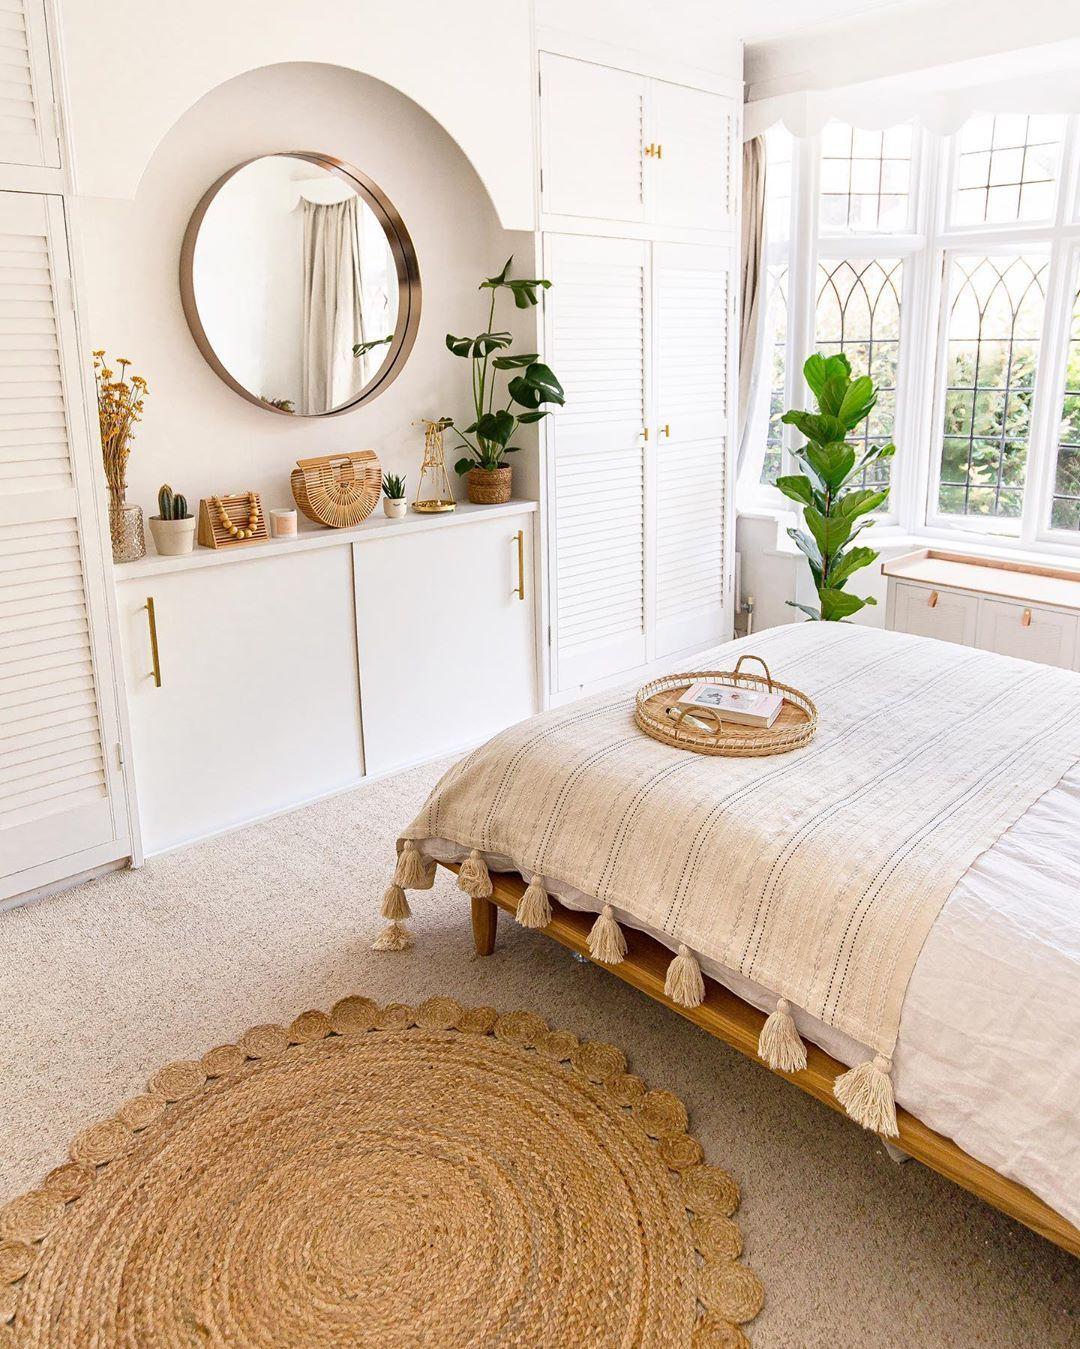 5 Minimalist Bedroom Design Ideas  Extra Space Storage in 5